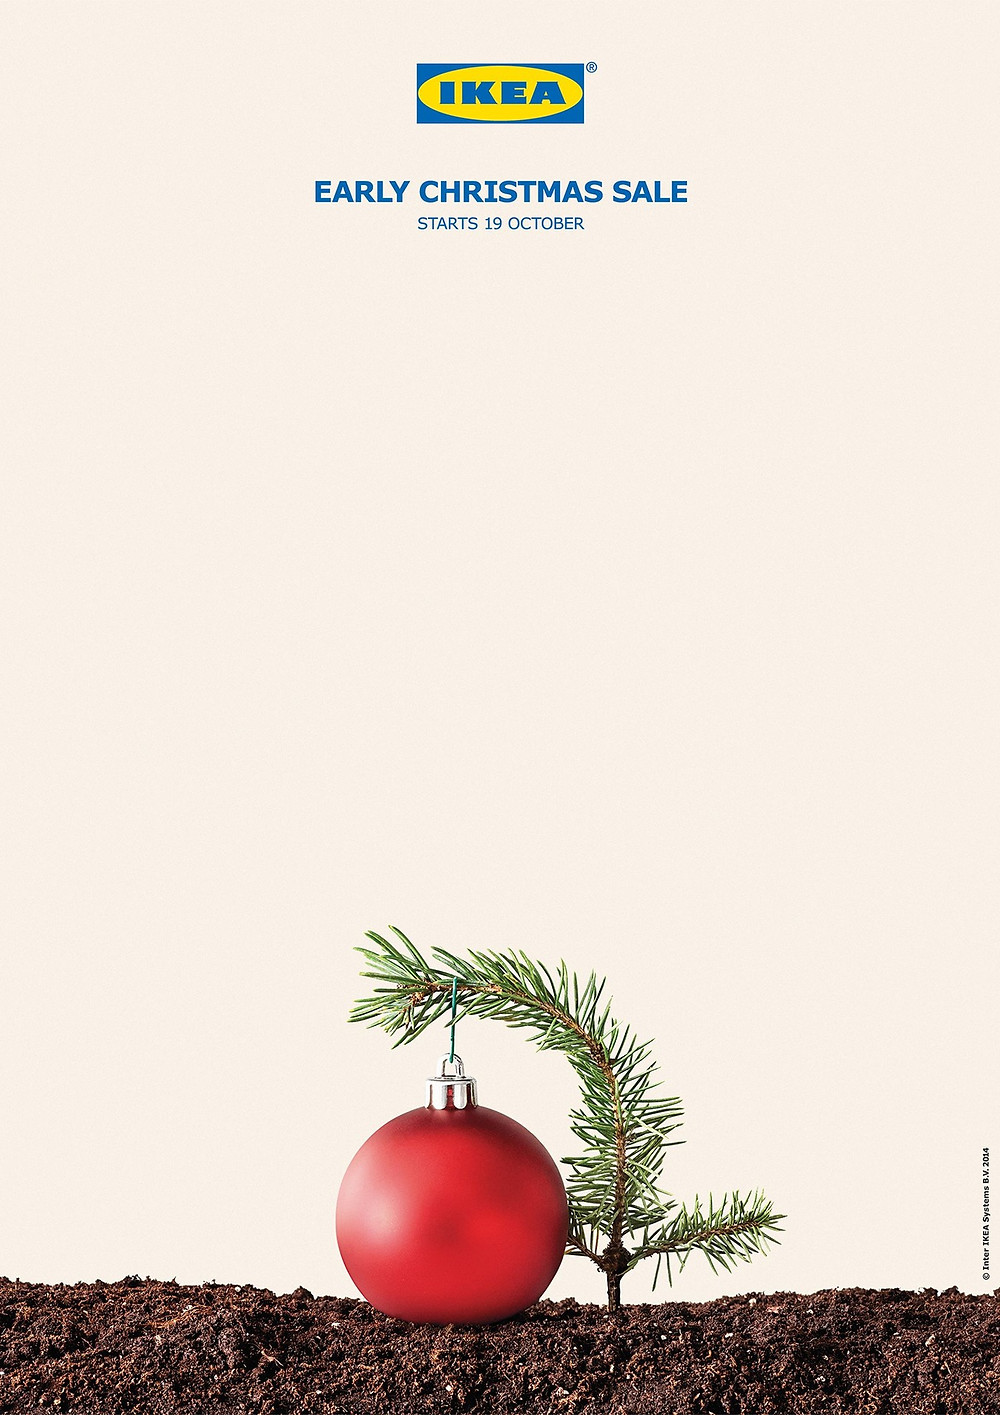 Nespresso Coffee Machine Christmas Advertising Banner